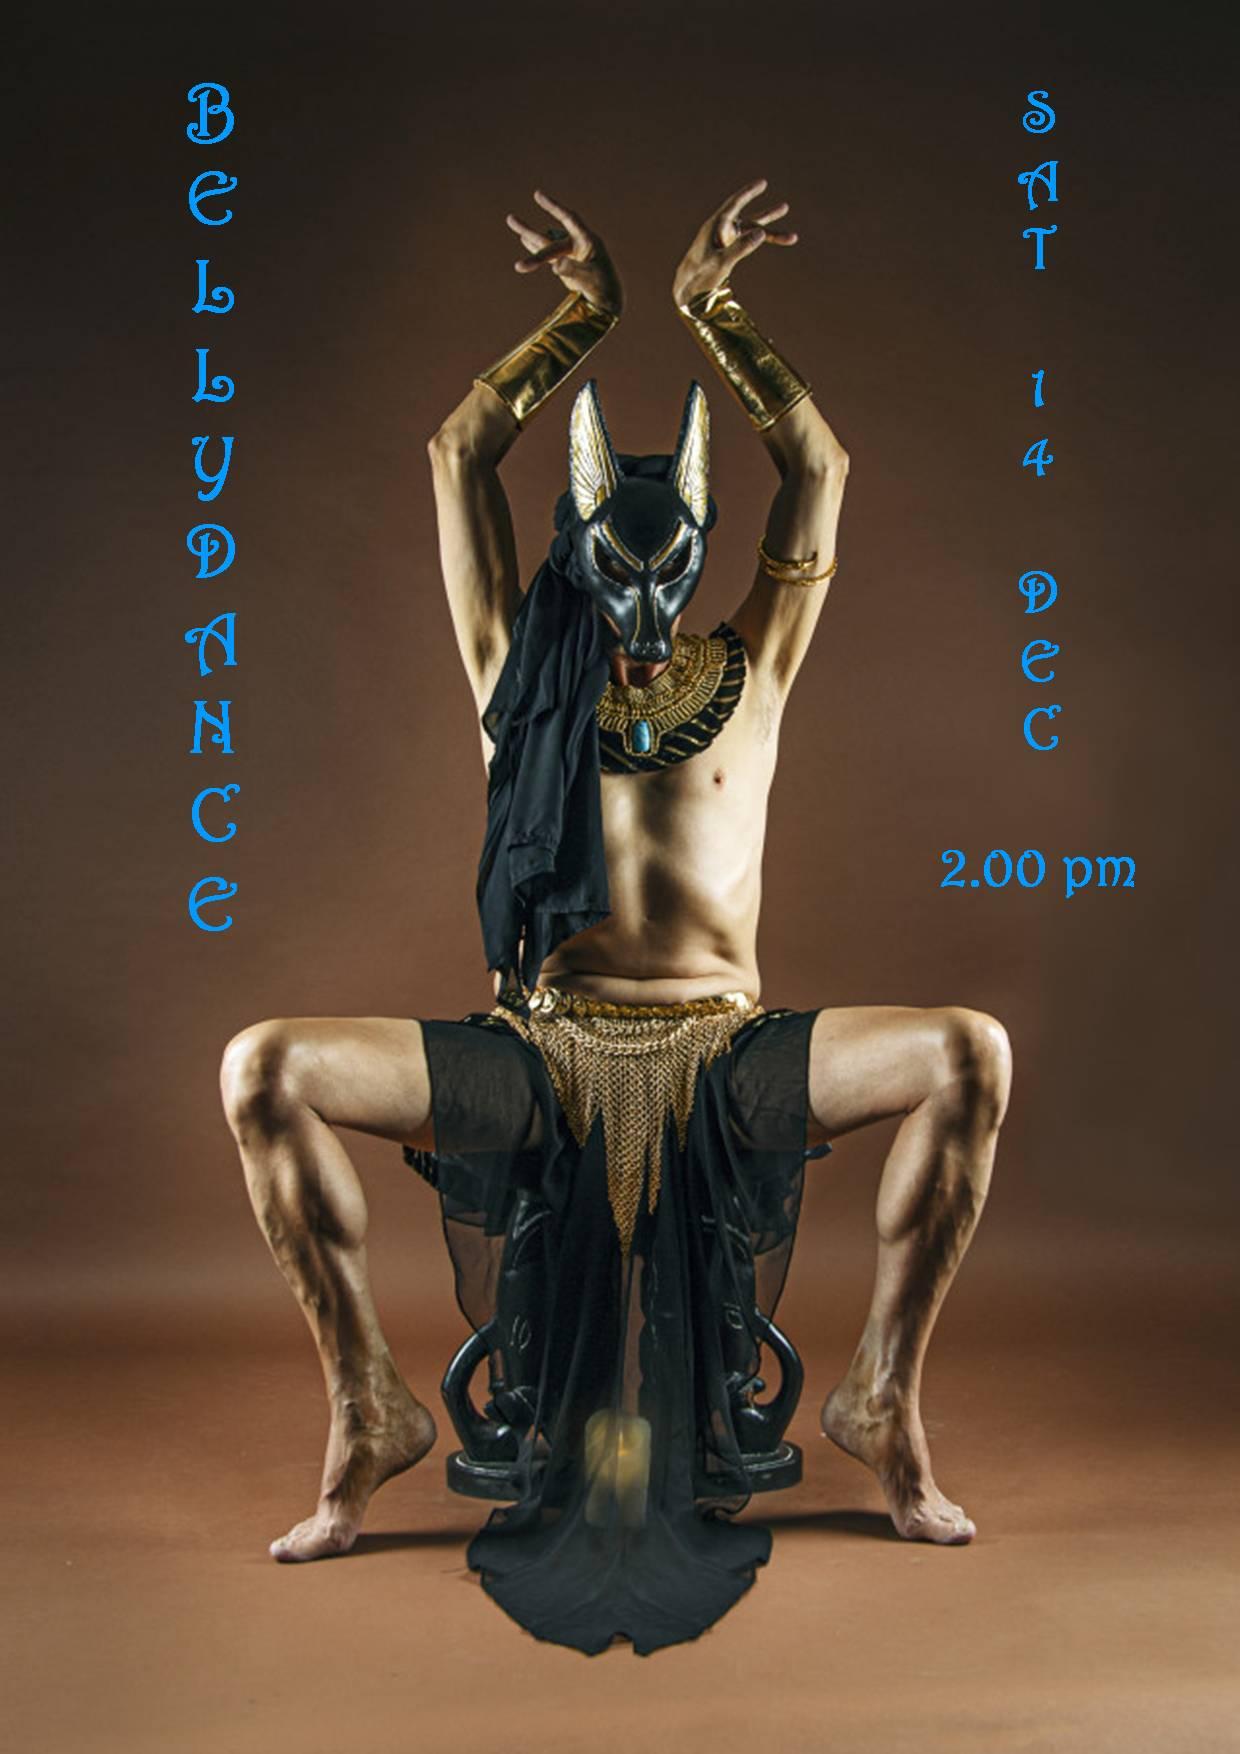 BELLYDANCE POSTER 14 DEC 2.00PM 2019